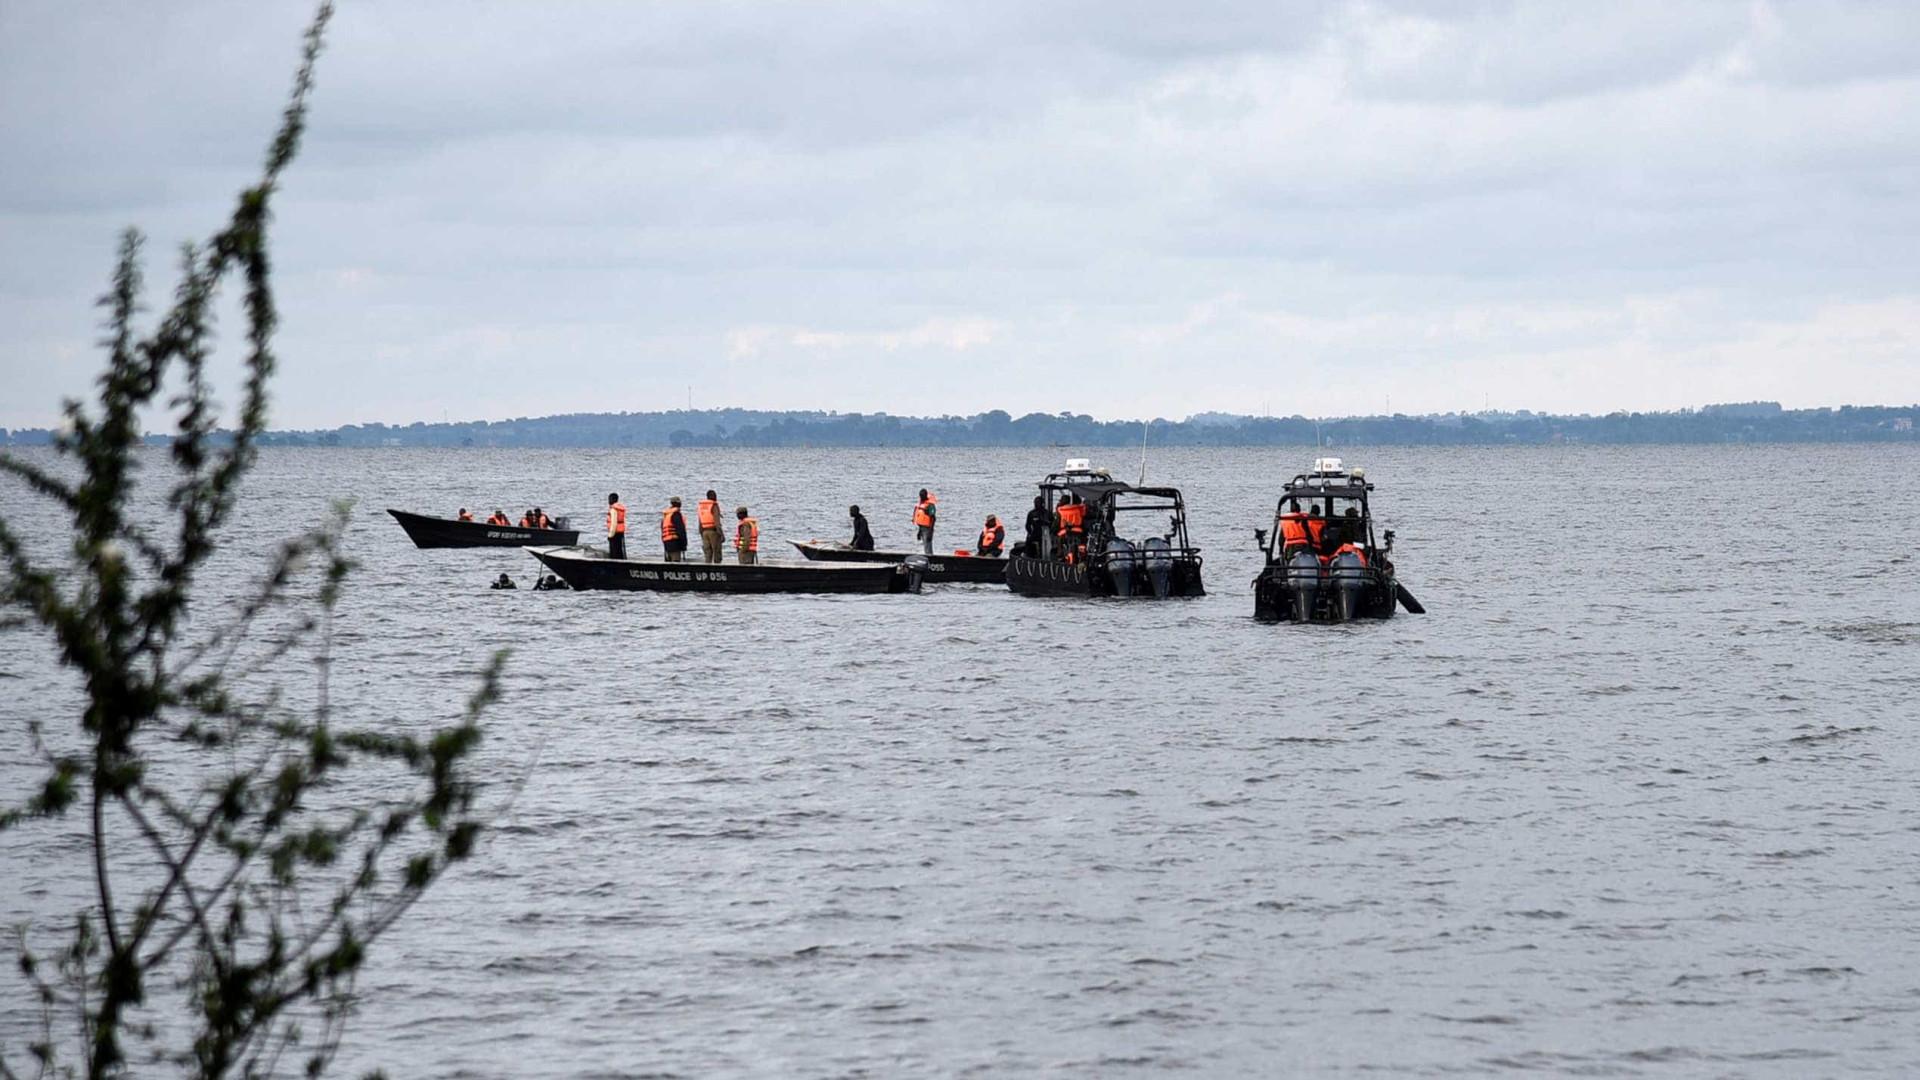 Naufrágio no rio Danúbio deixa pelo menos 7 mortos na Hungria